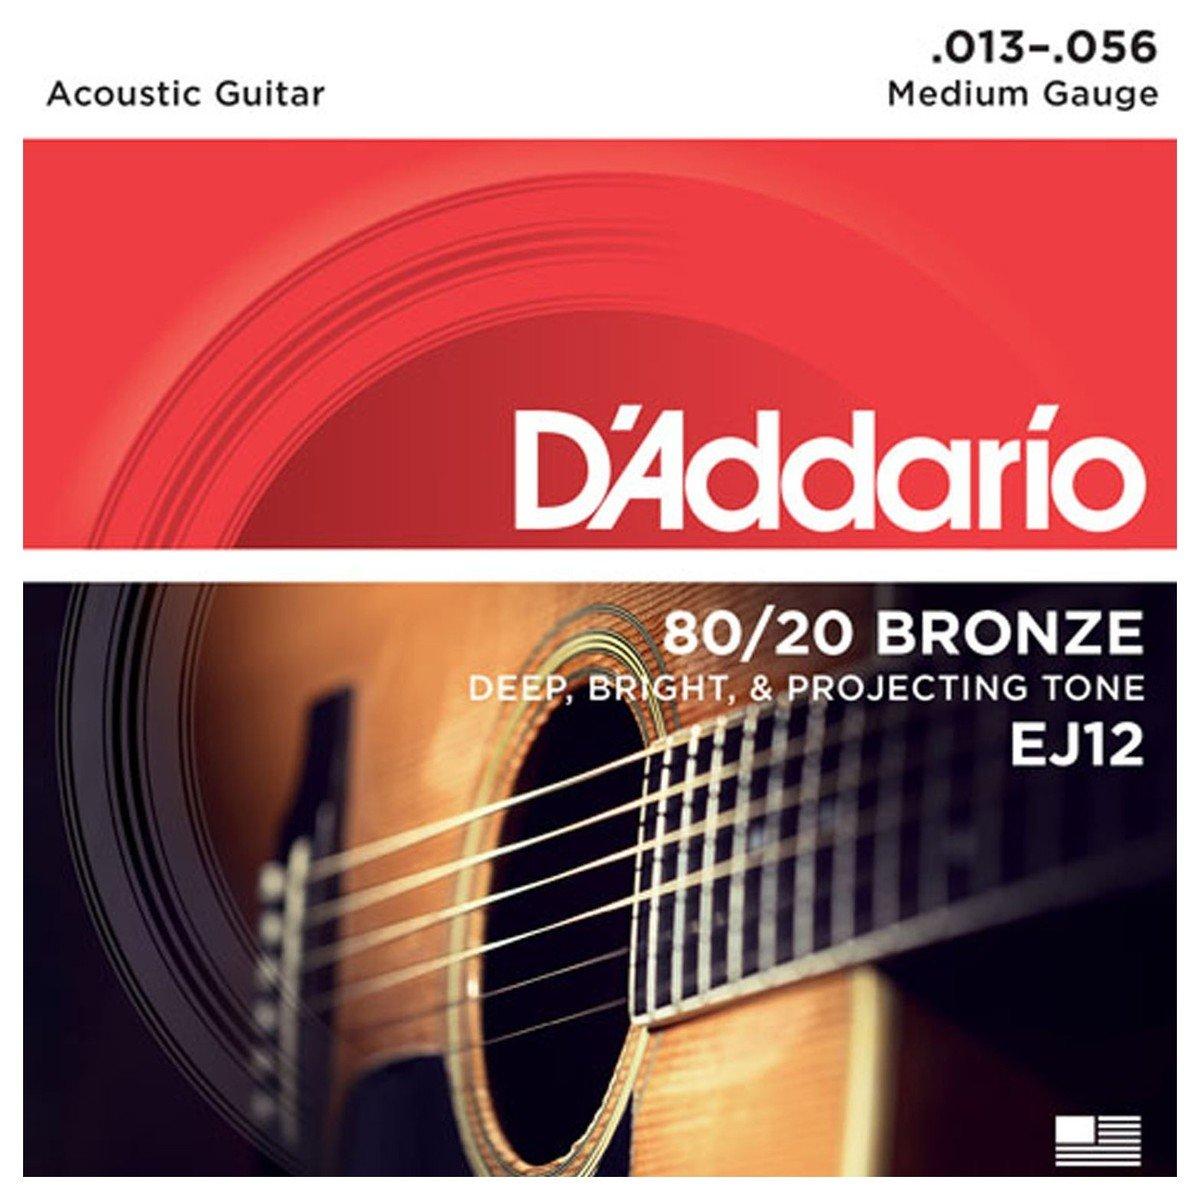 D'addario EJ12 Acoustic Guitar Strings